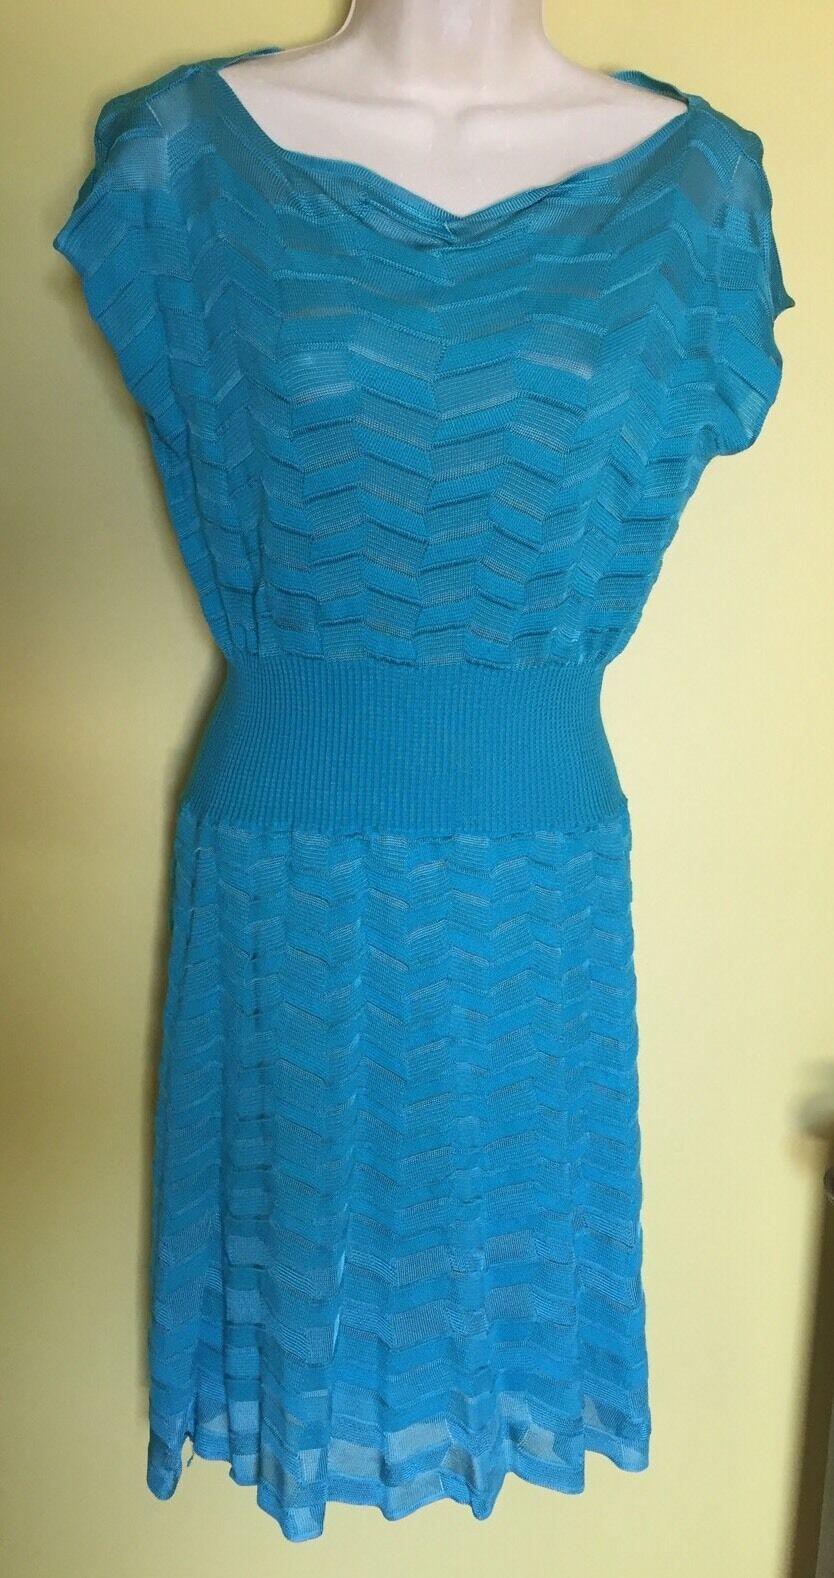 New Missoni Chevron Knit Stretch Turquoise Aqua bluee DRESS 4 40 S